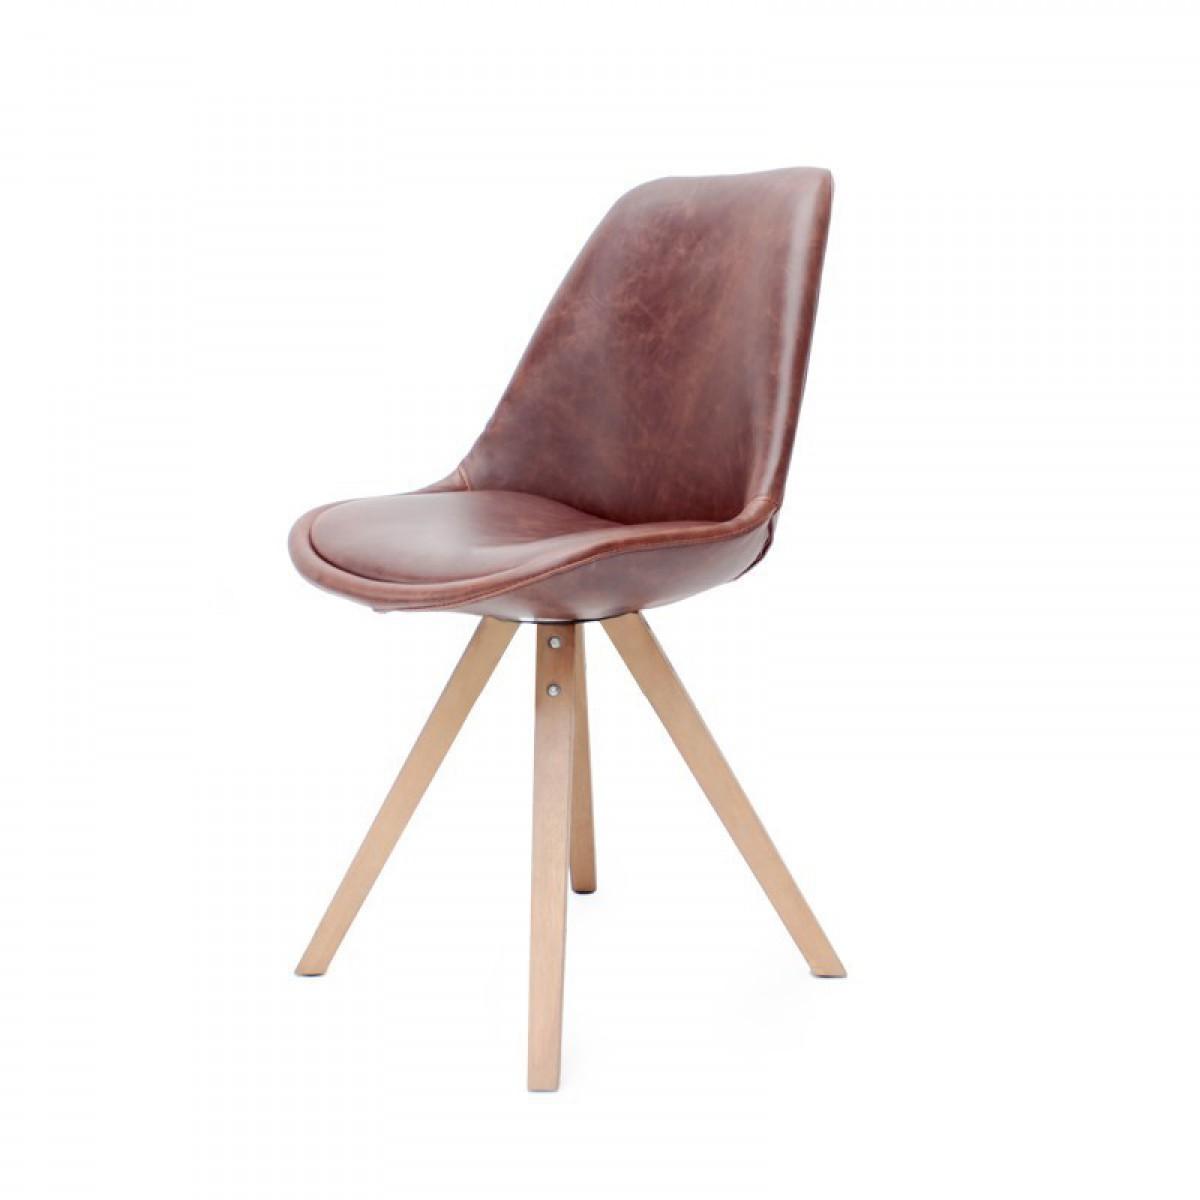 bari-kuipstoel-eetkamerstoel-stoel-label51-pu-leder-stoer